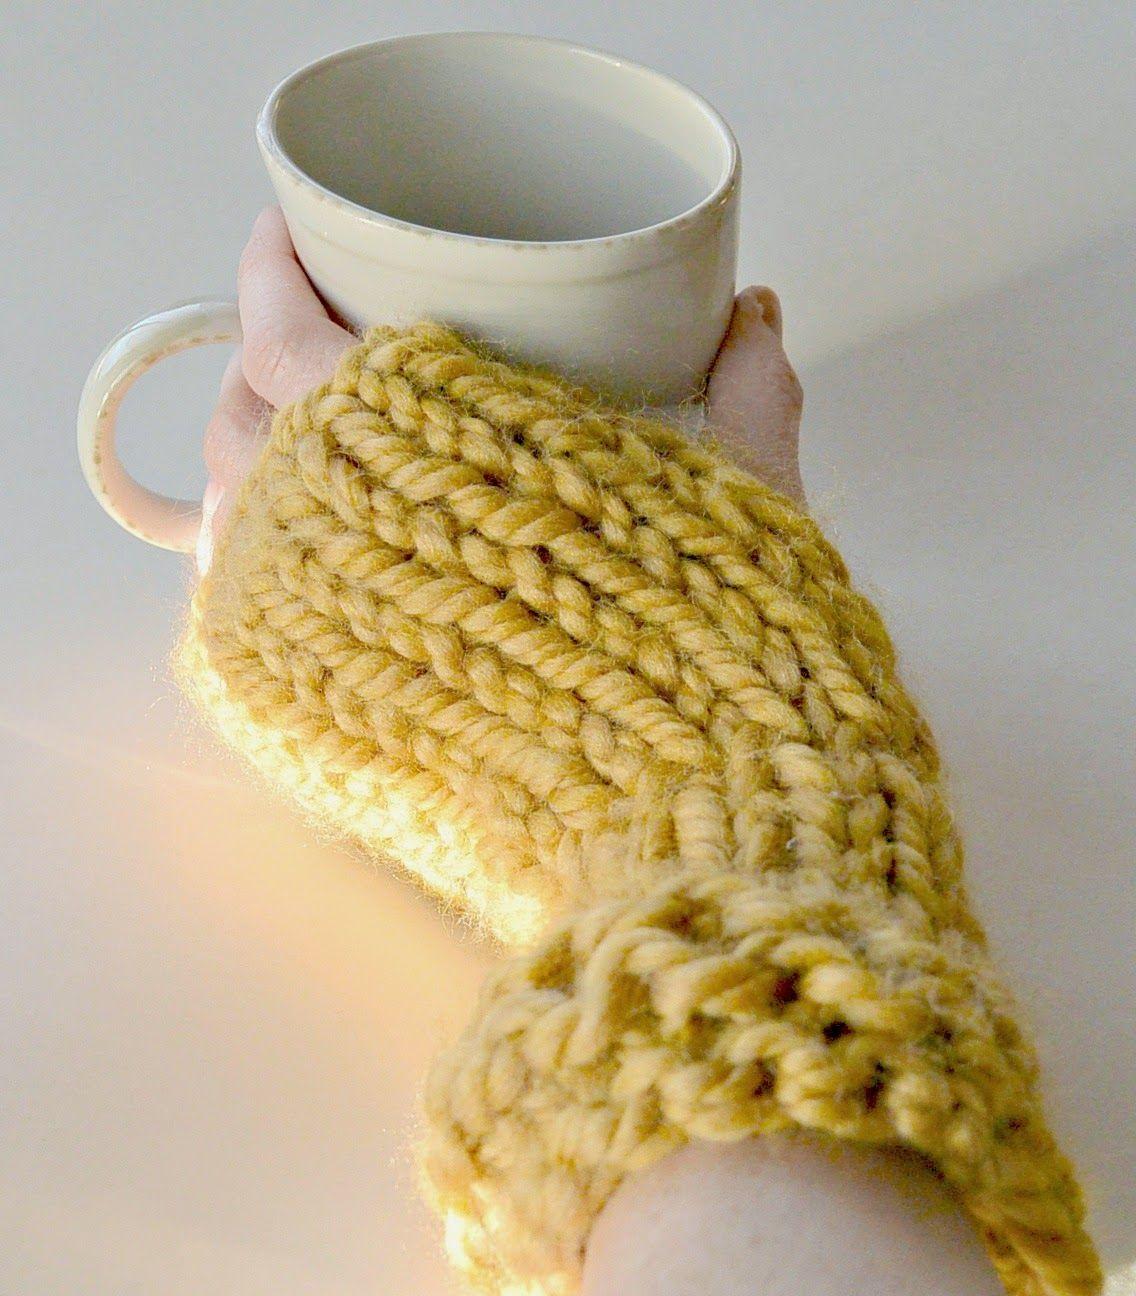 Knit Flat Fingerless Mittens – Straw Bed Fingerless Gloves | Mama In ...